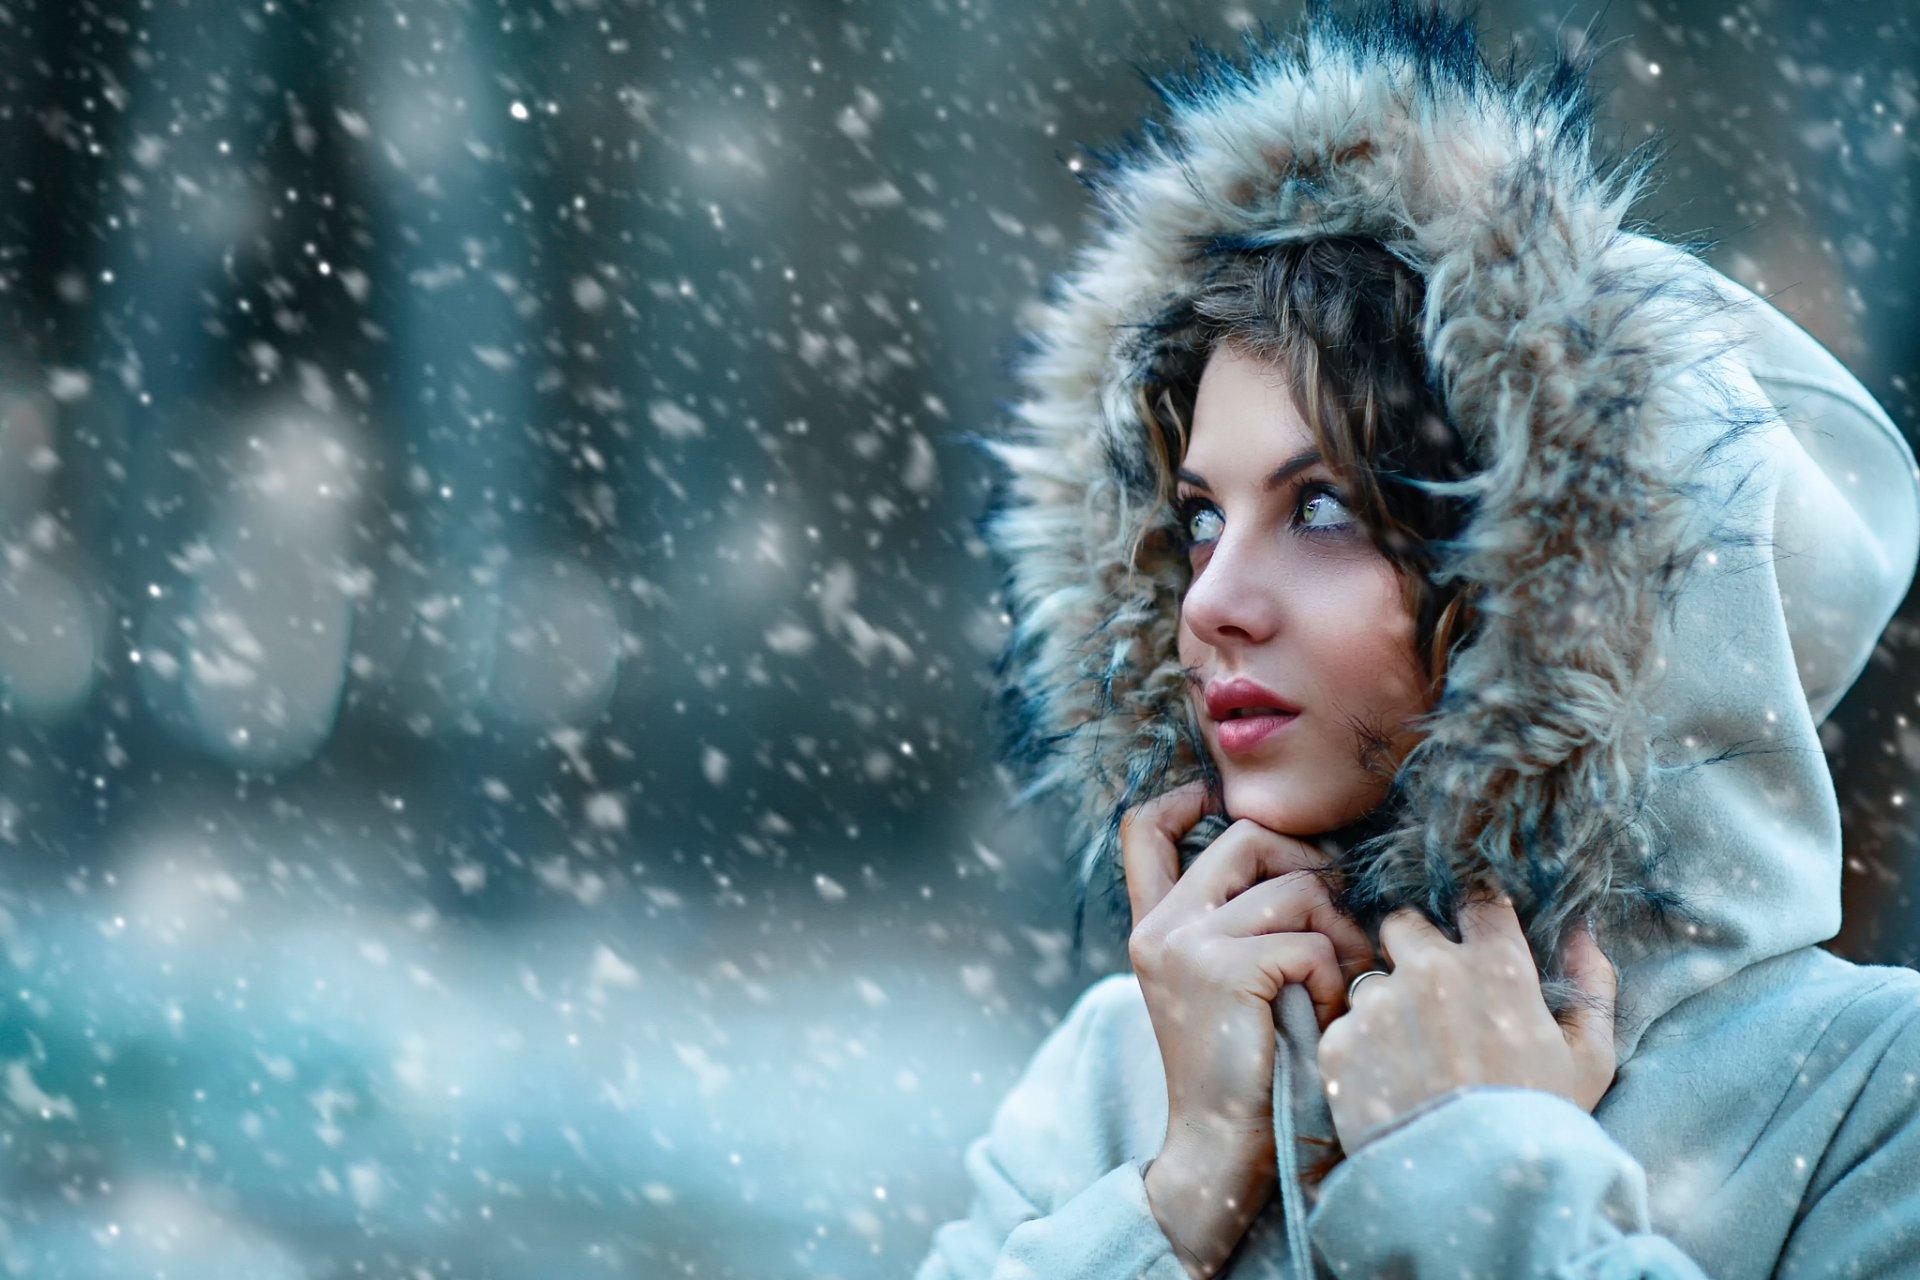 Фото девушки зимой вечером